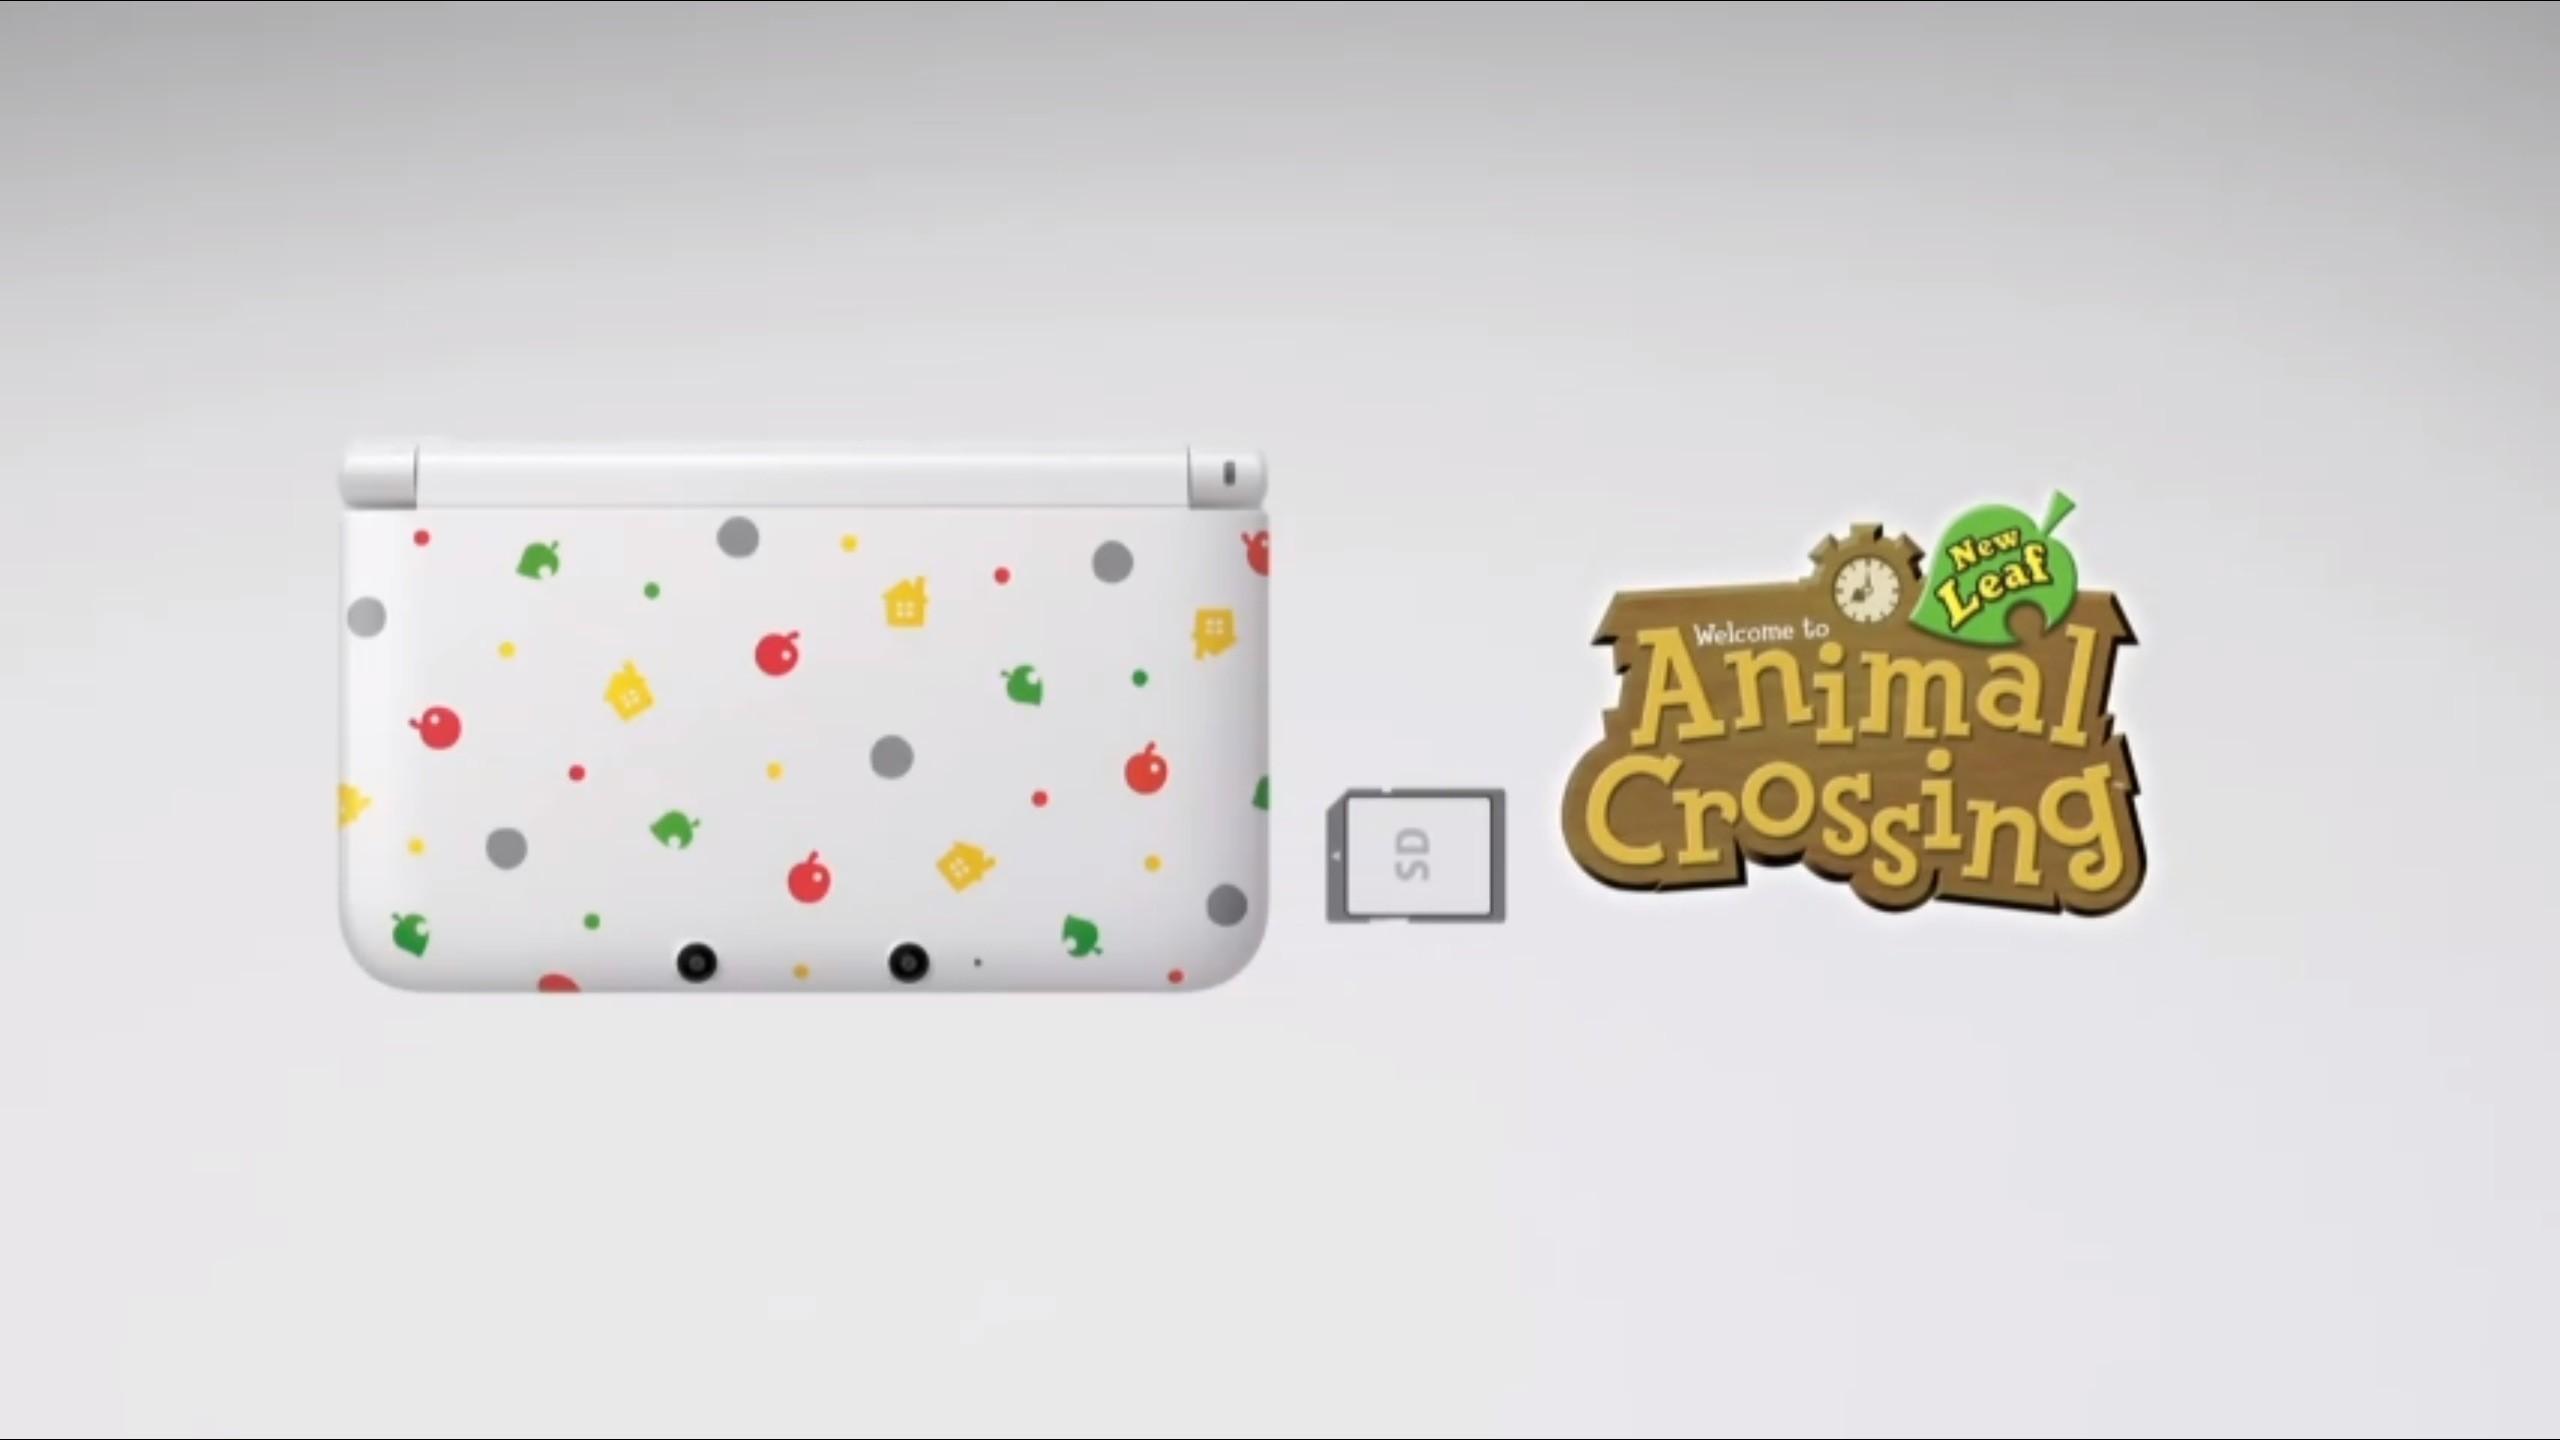 Animal Crossing 3Ds XL- Nintendo Direct